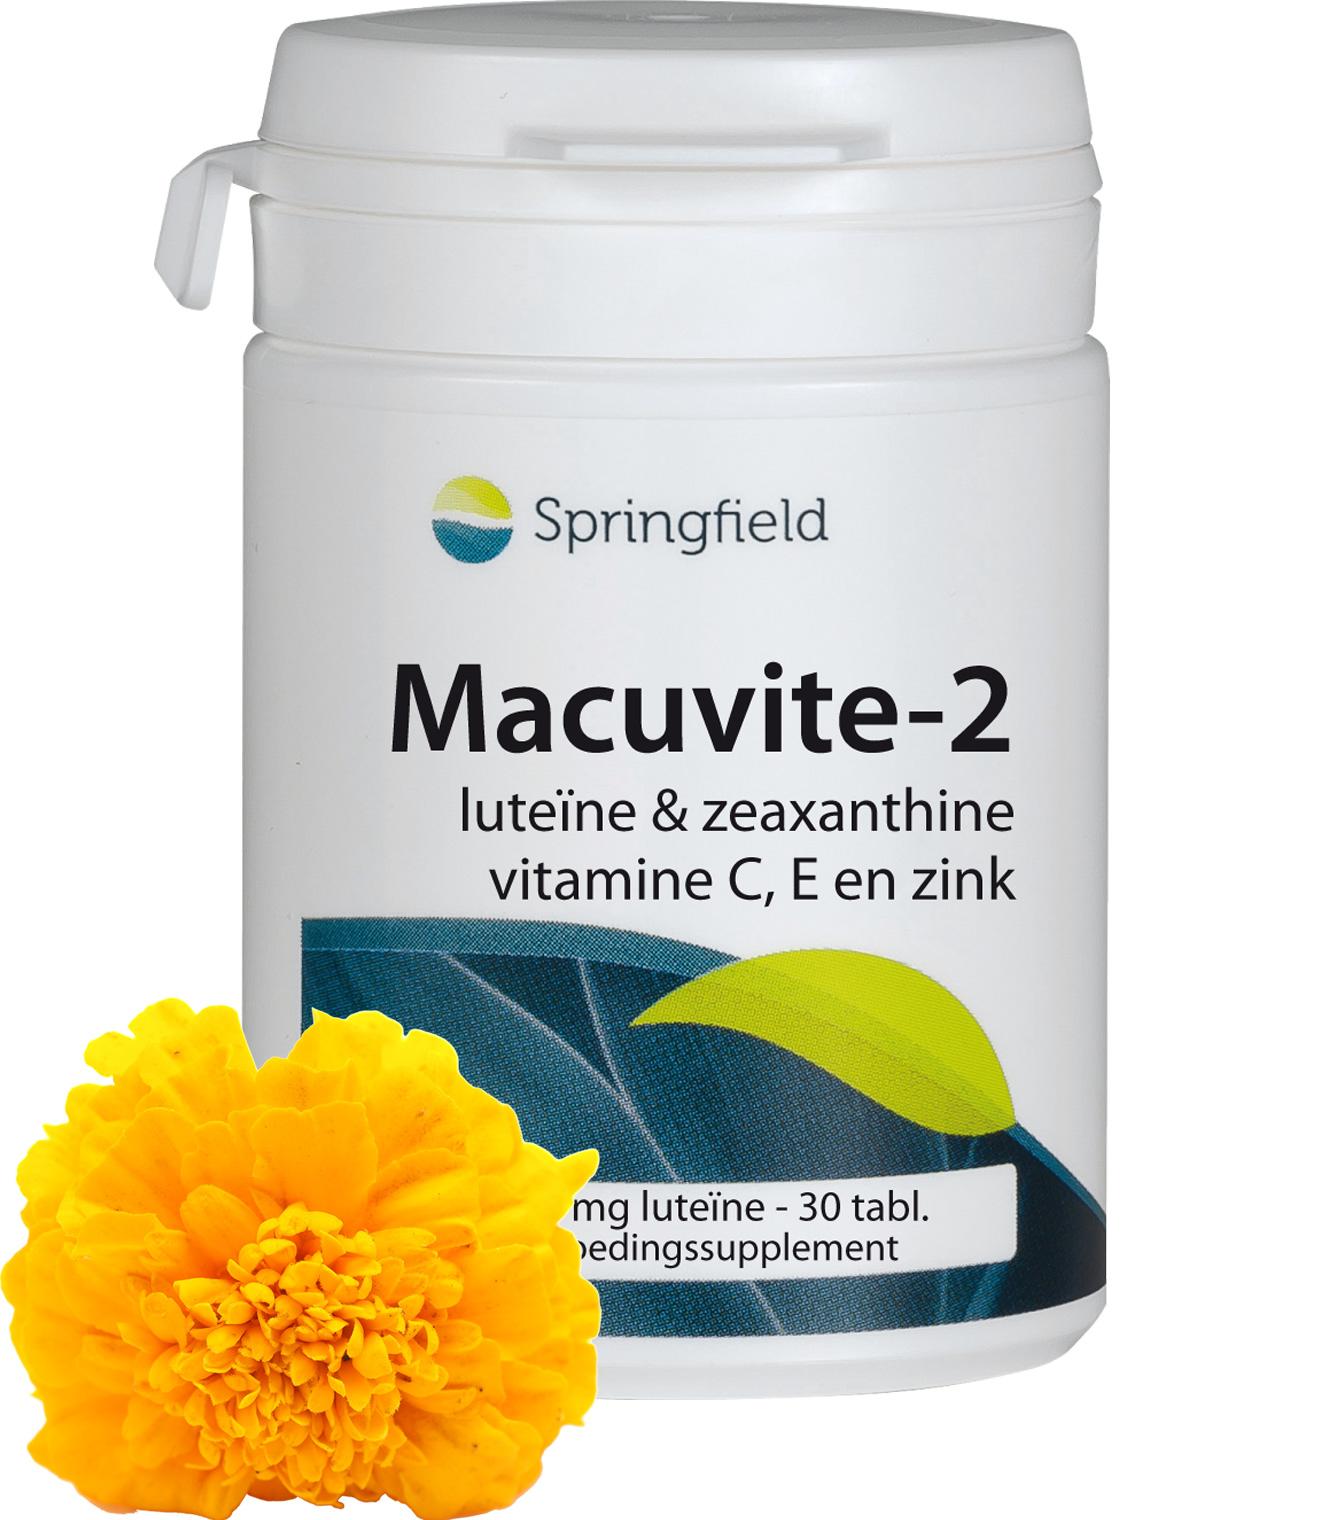 Macuvite-2 luteïne, zeaxanthine met vitamine C & E en zink